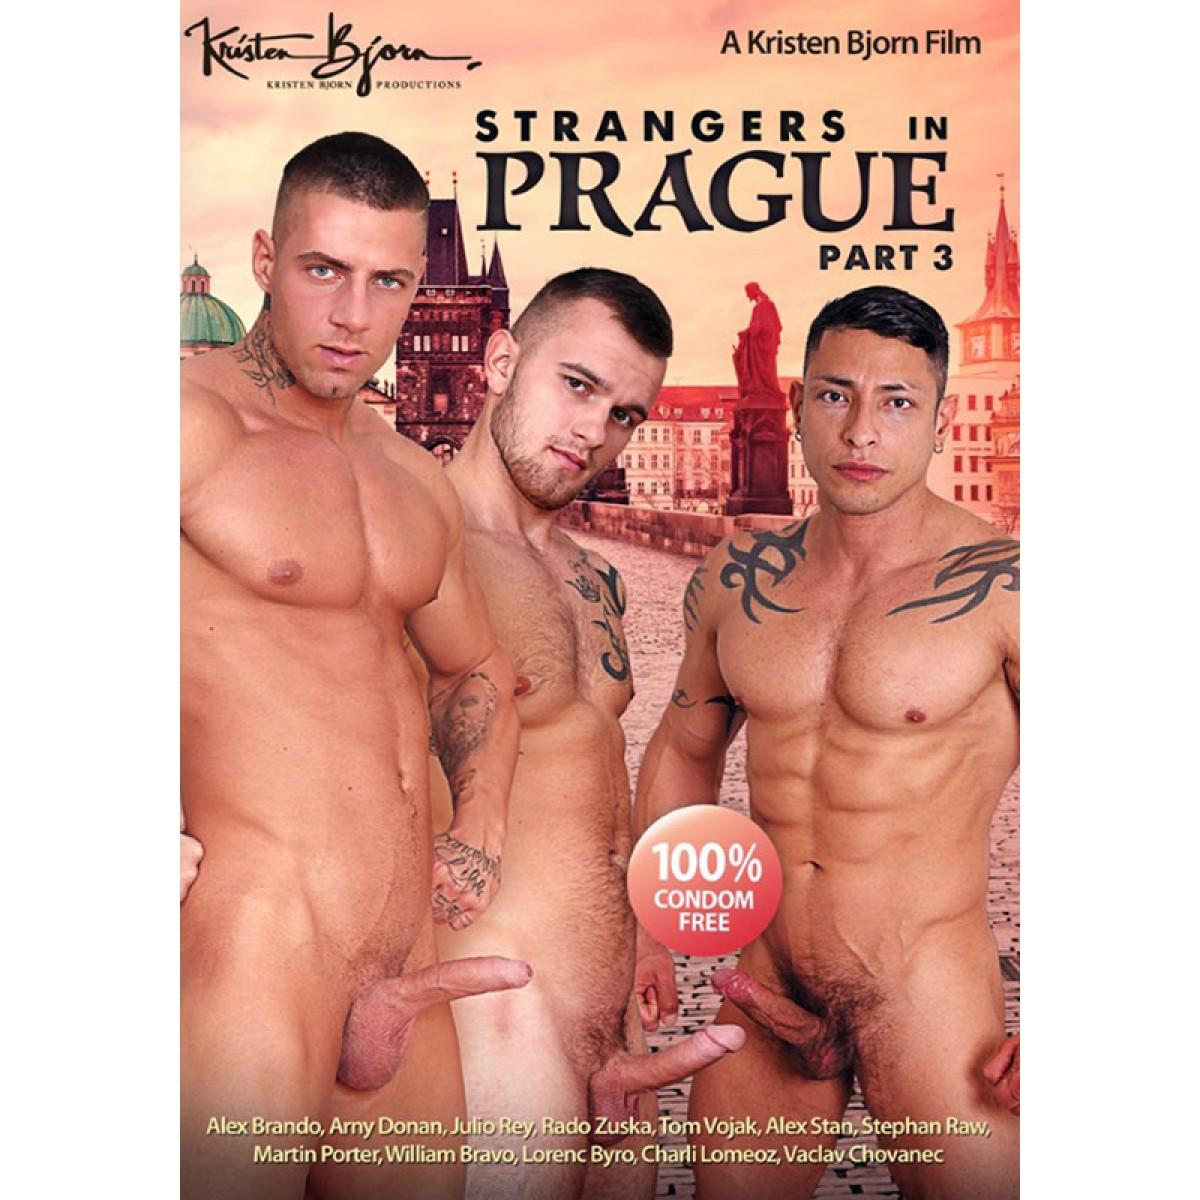 Arny Donan Orgy Gay Porn strangers in prague part 3 dvd (s)